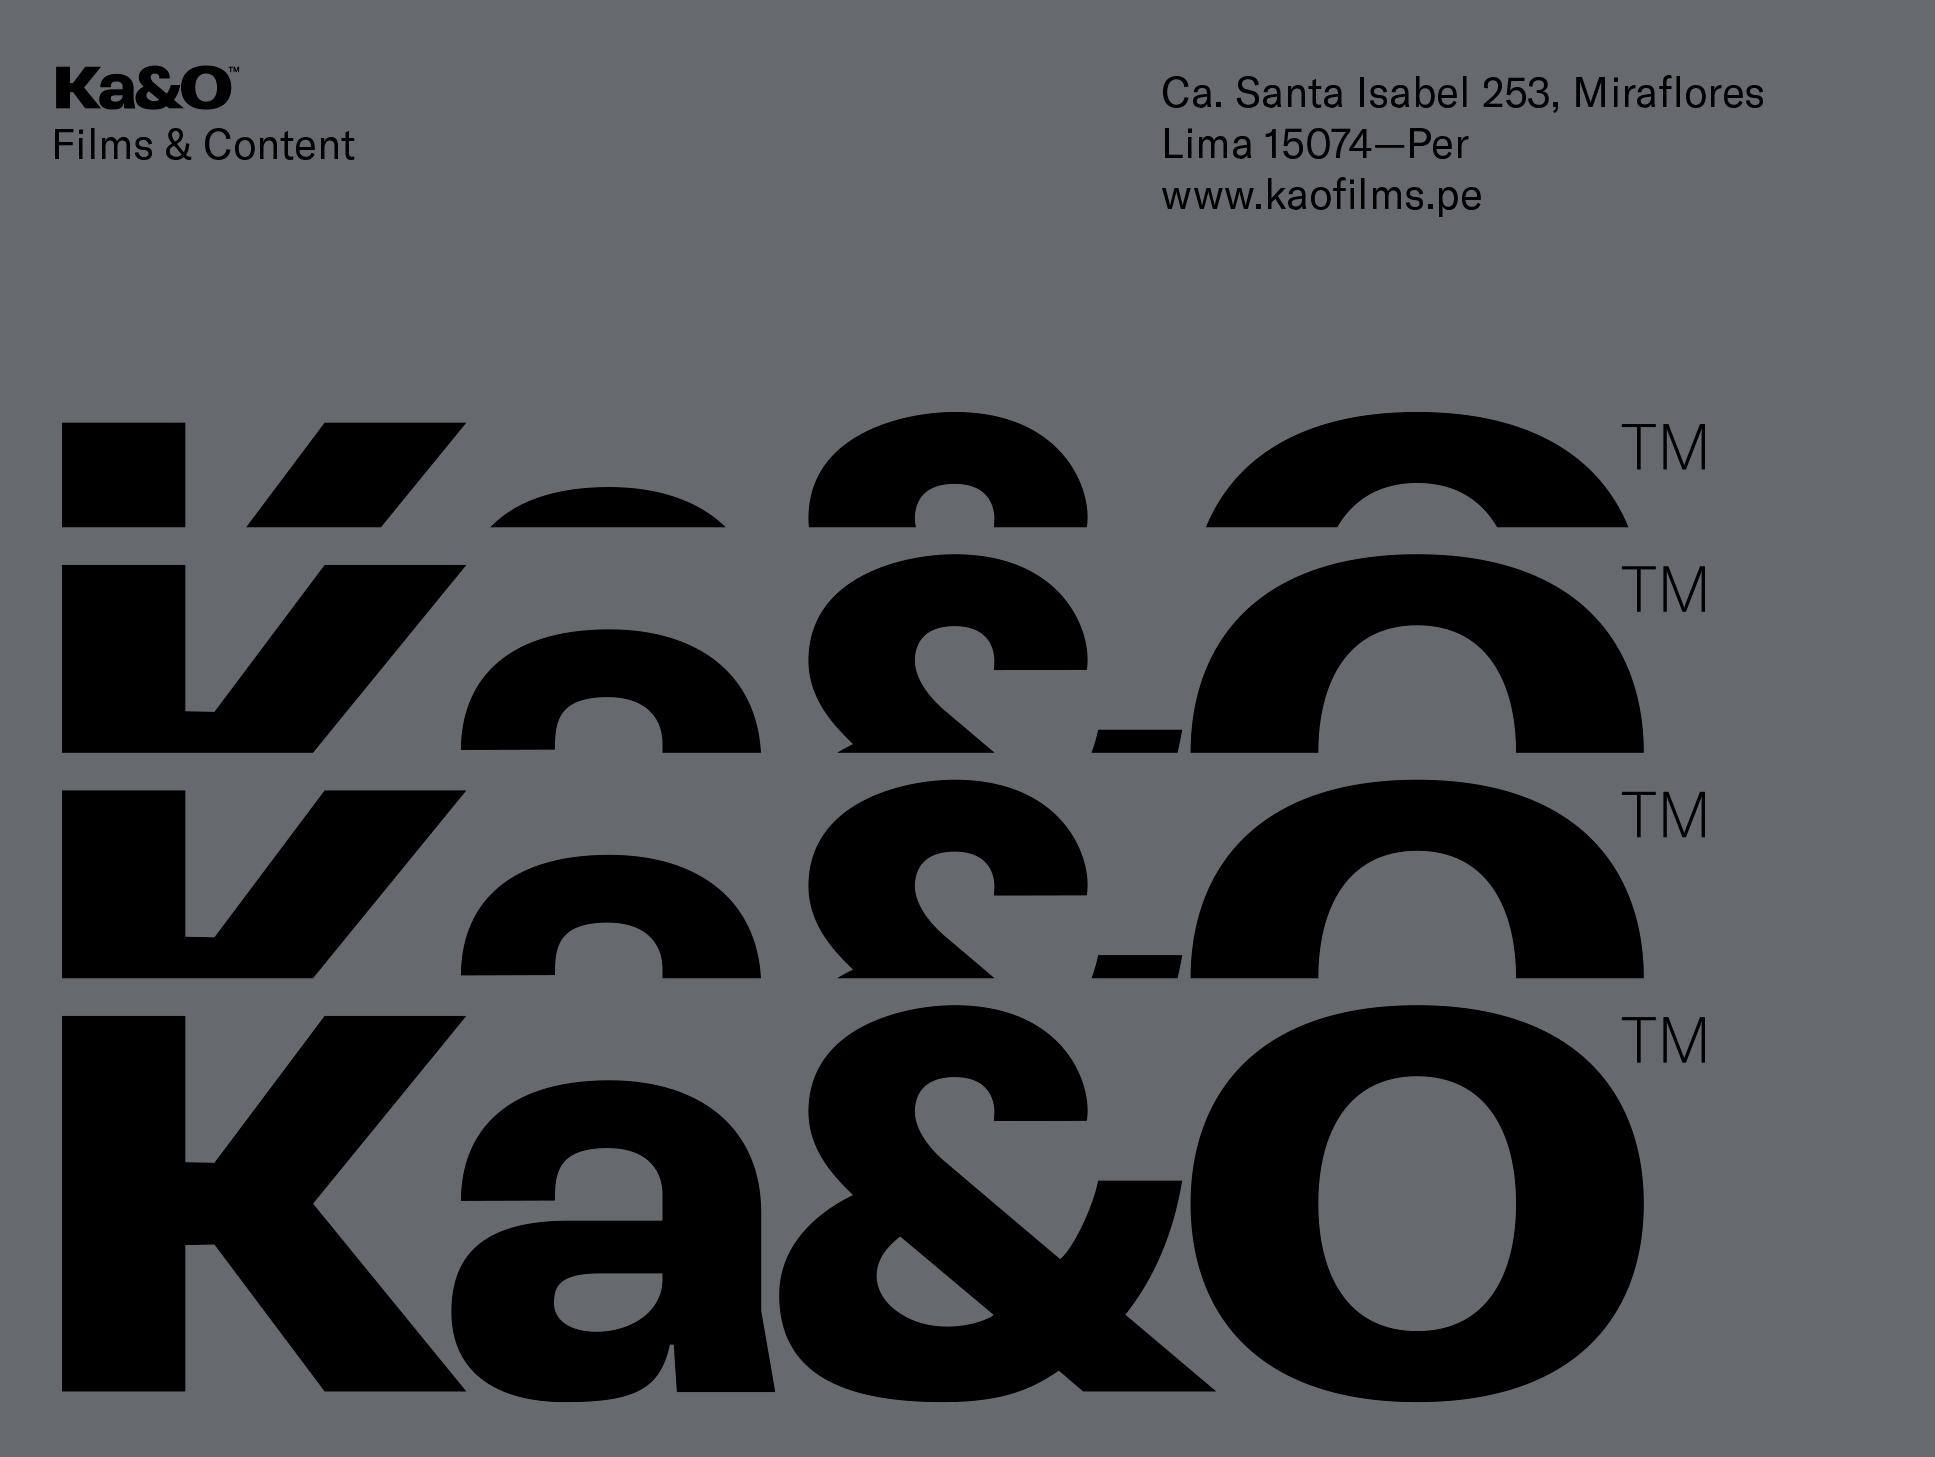 KA&O Films & Content